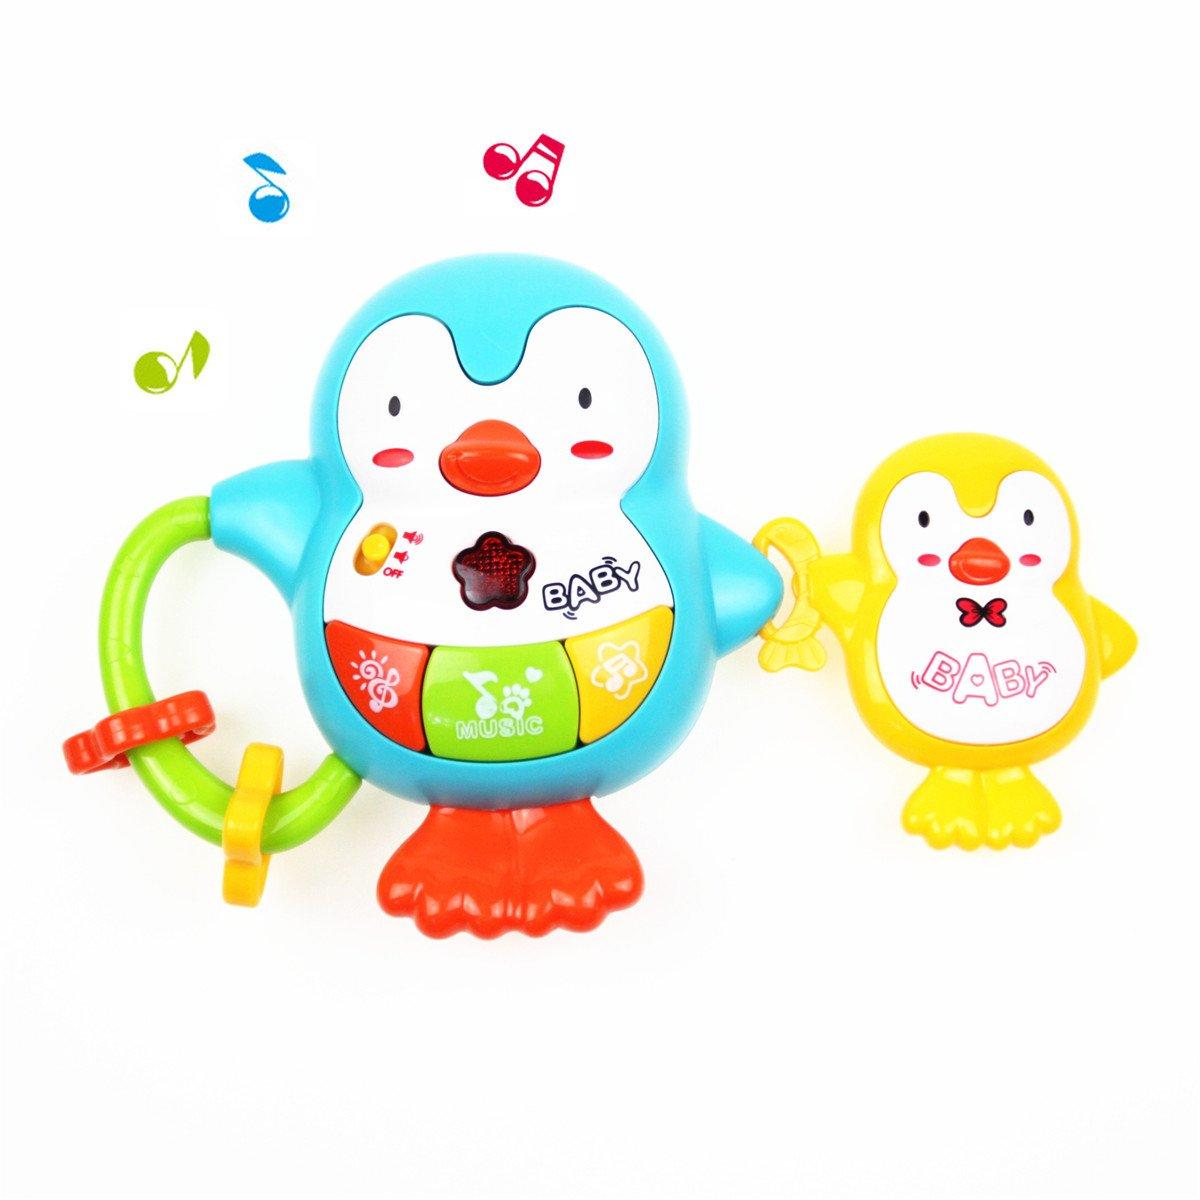 Chimstar Baby Musical Toys